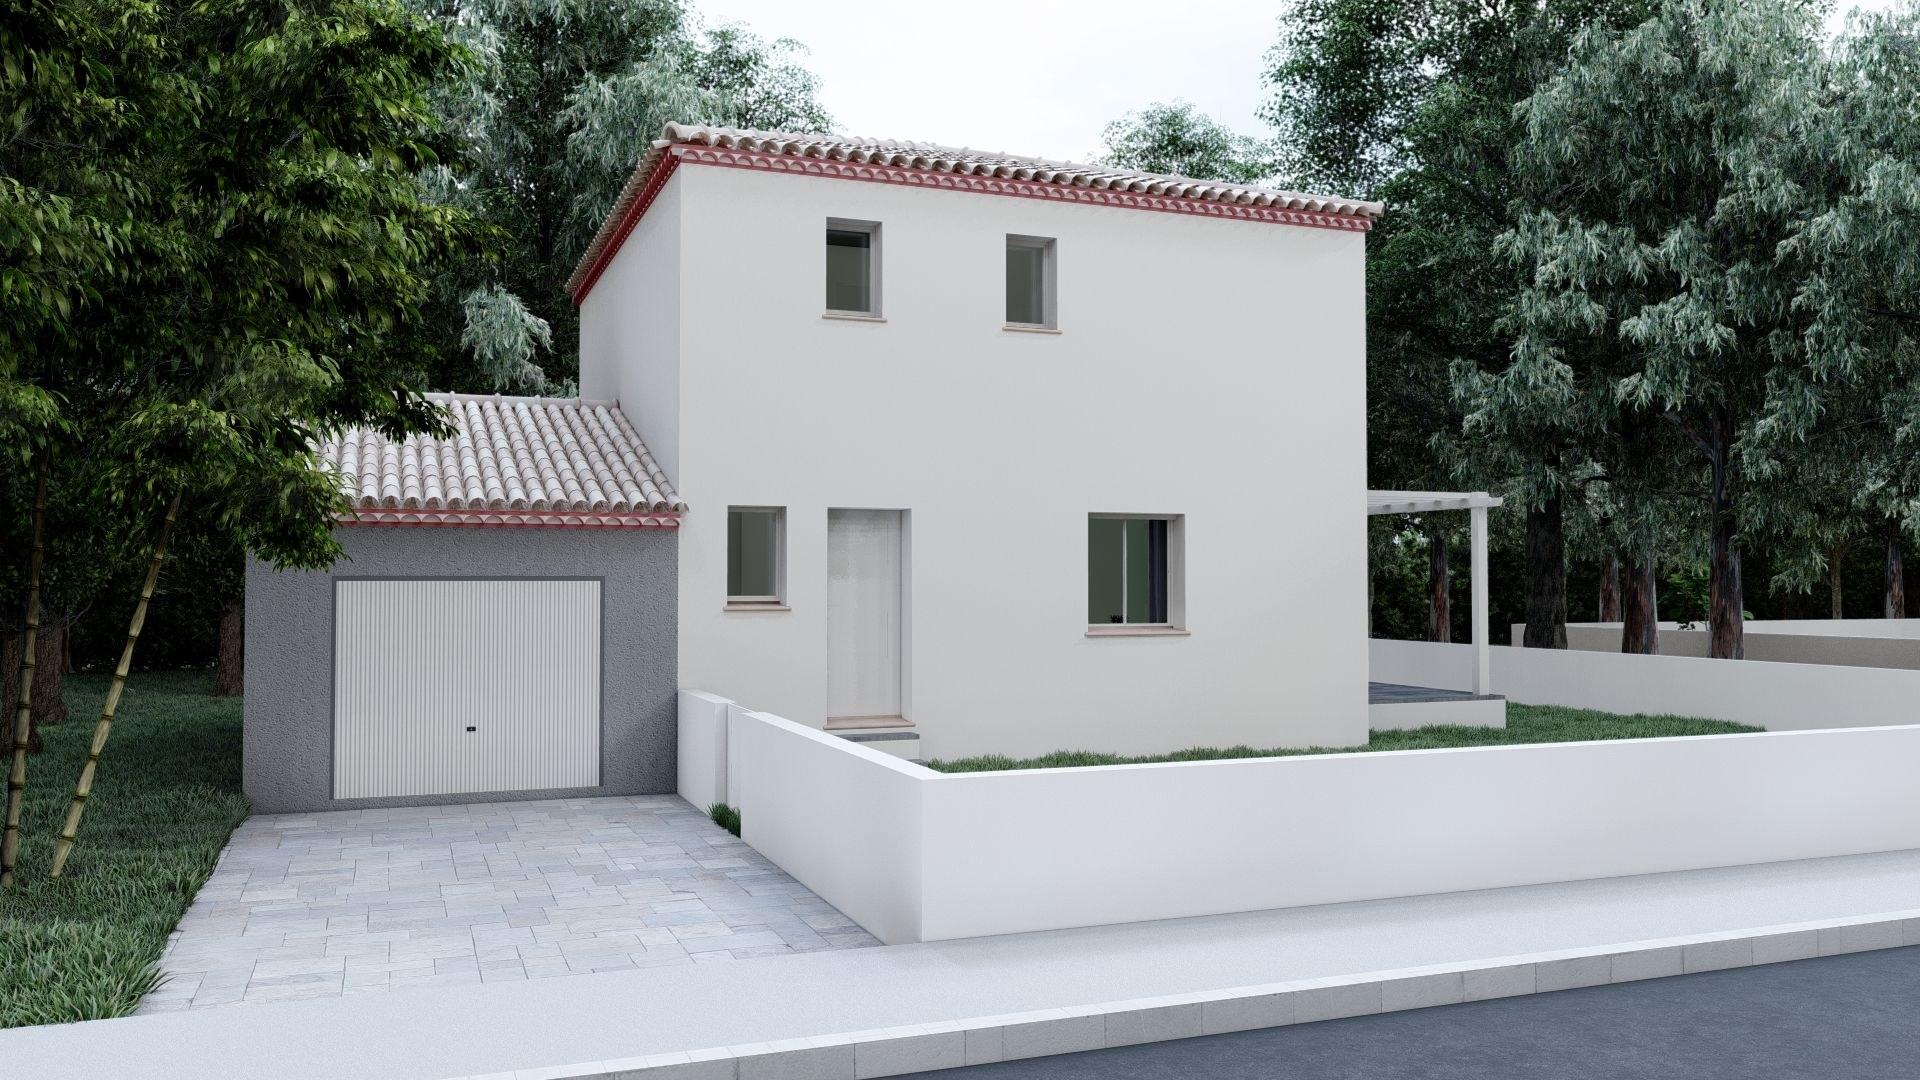 12- Bastide traditionnelle 100 m²